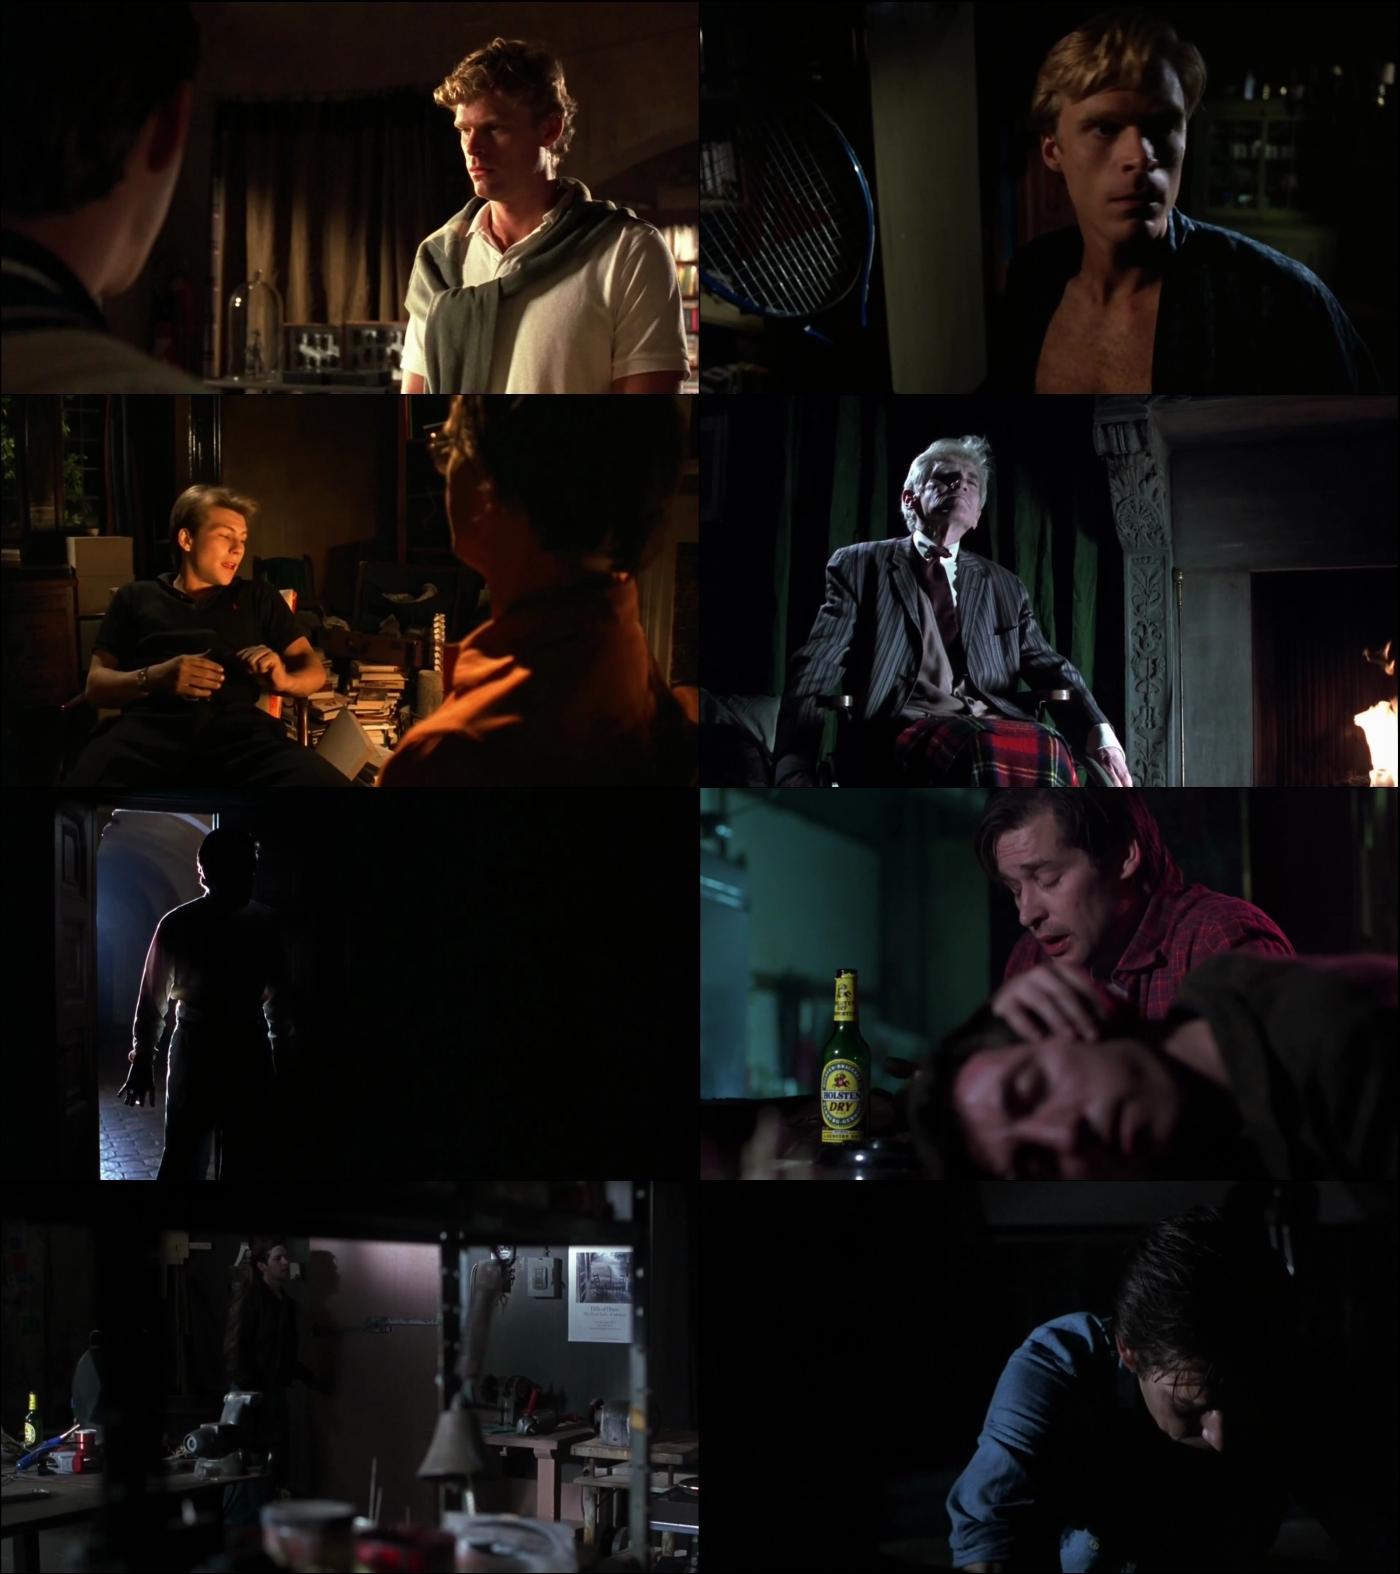 Historias Del Lado Oscuro 1080p Latino